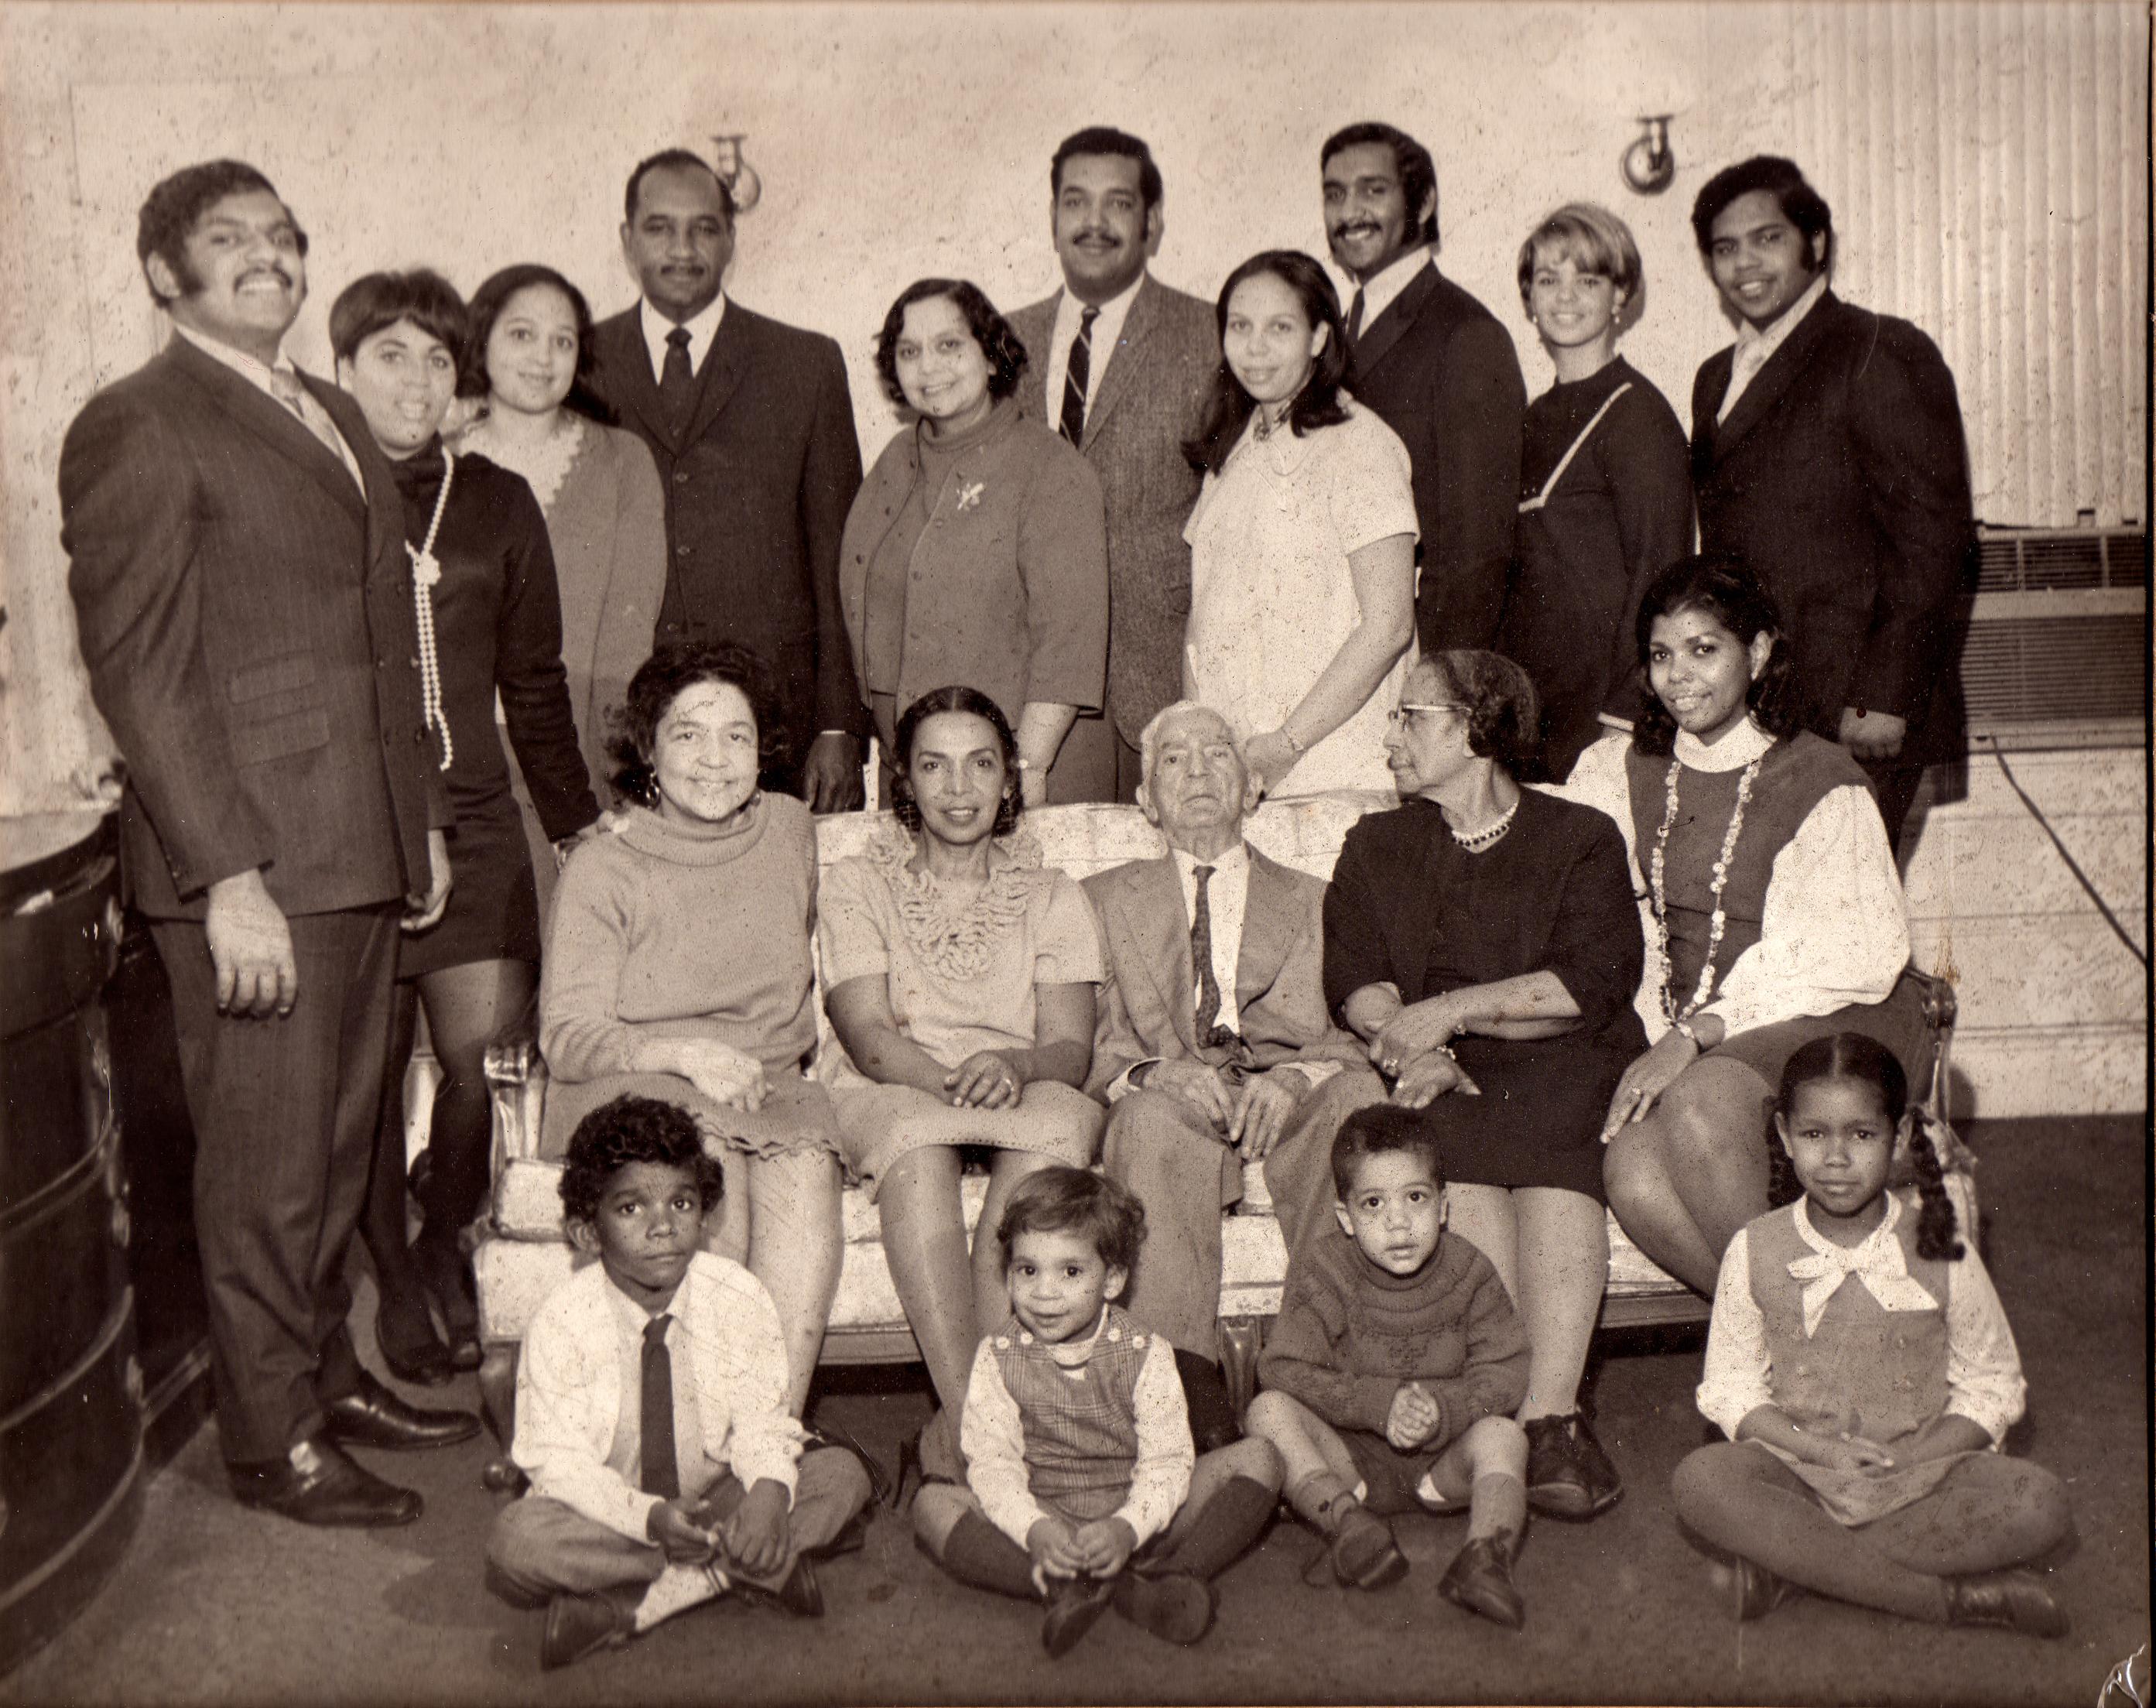 31-b&w photo of the Jackson Family300